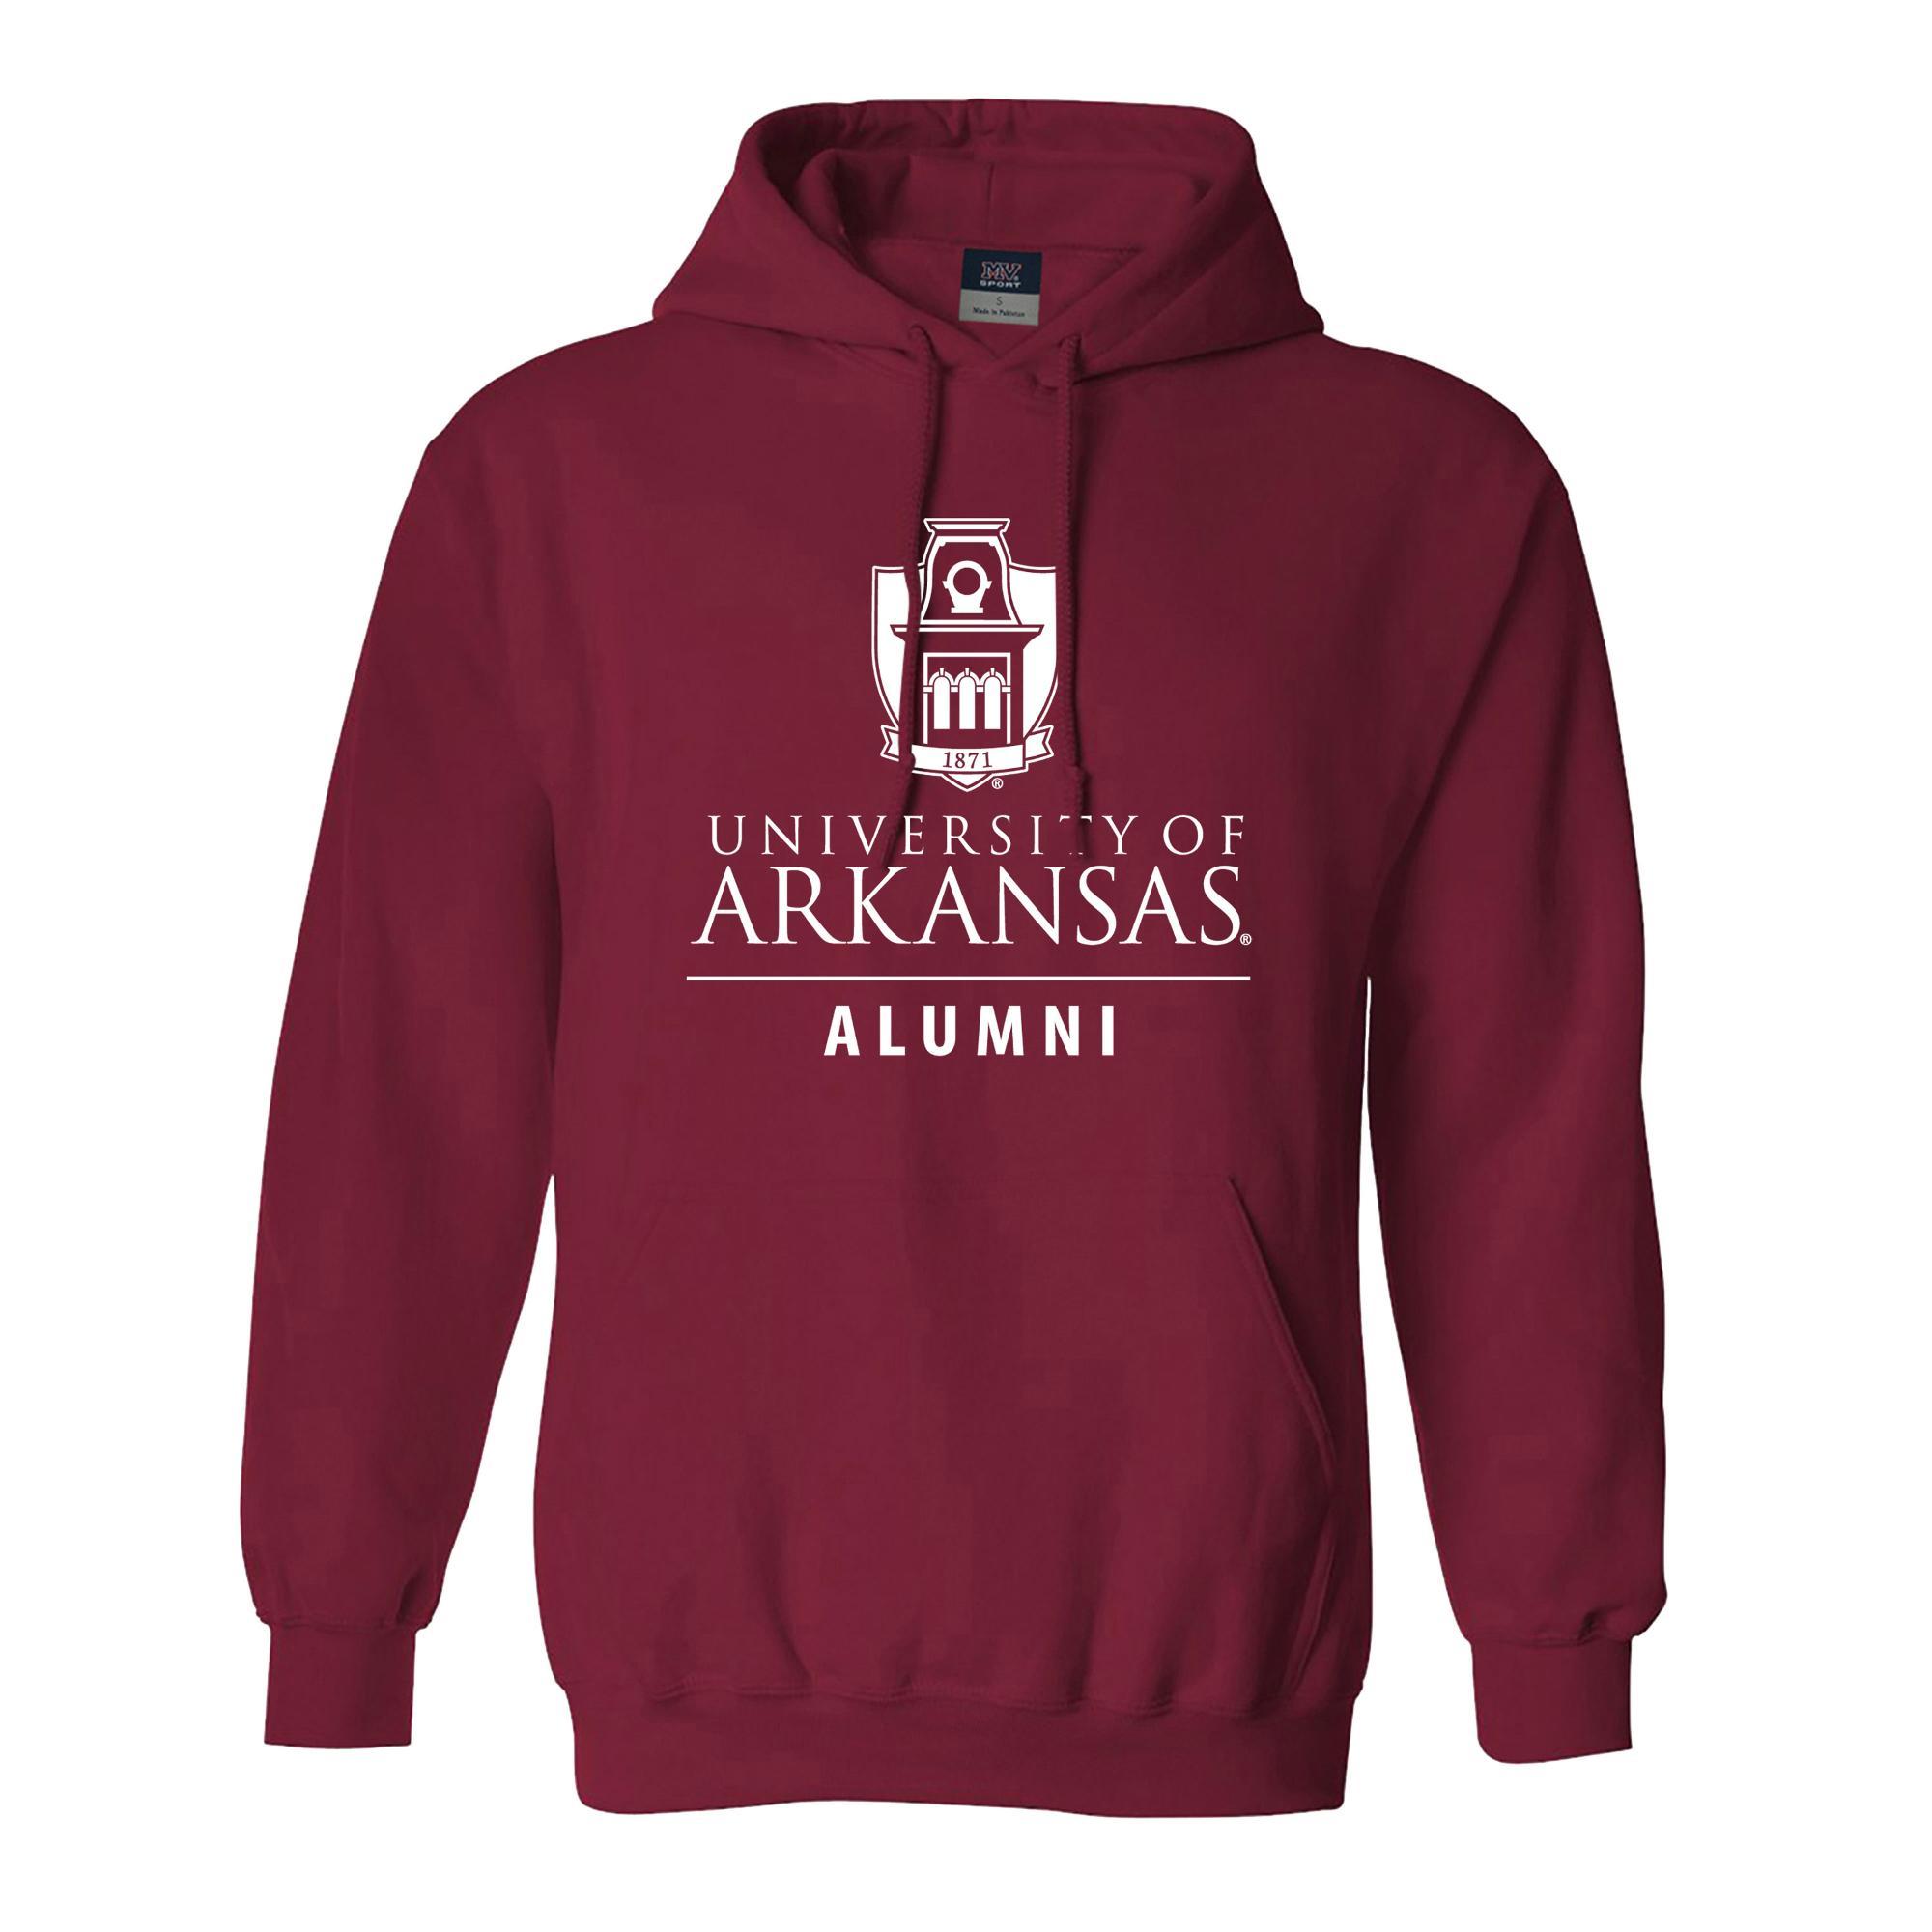 image of: University of Arkansas Old Main Tower Alumni Hoodie- Crimson